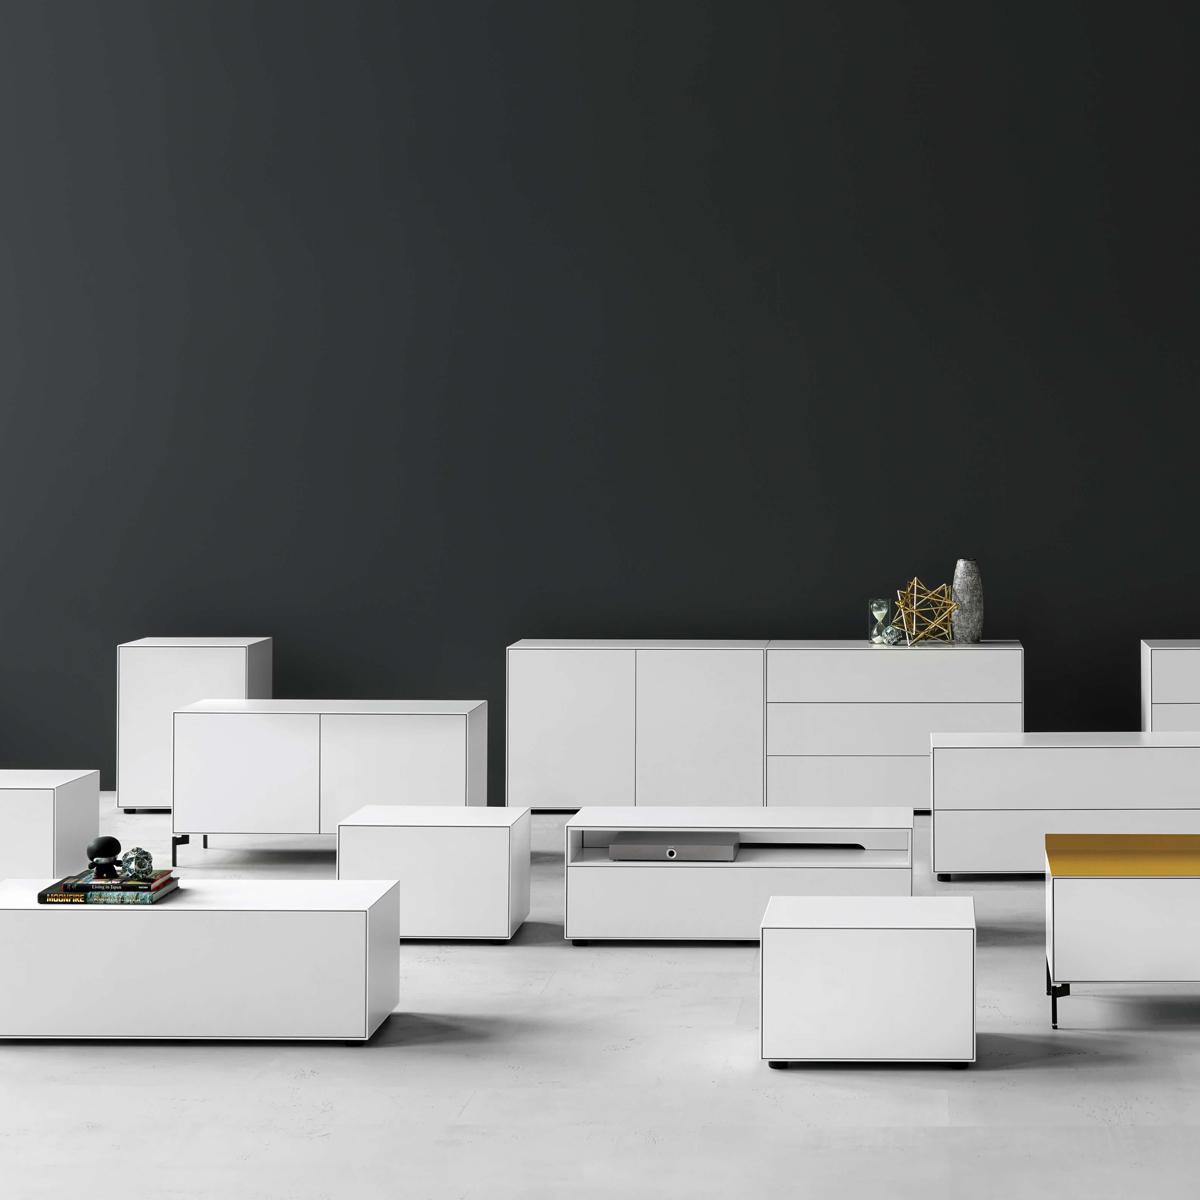 piure nex pur box sideboard nennmann form und funktion. Black Bedroom Furniture Sets. Home Design Ideas